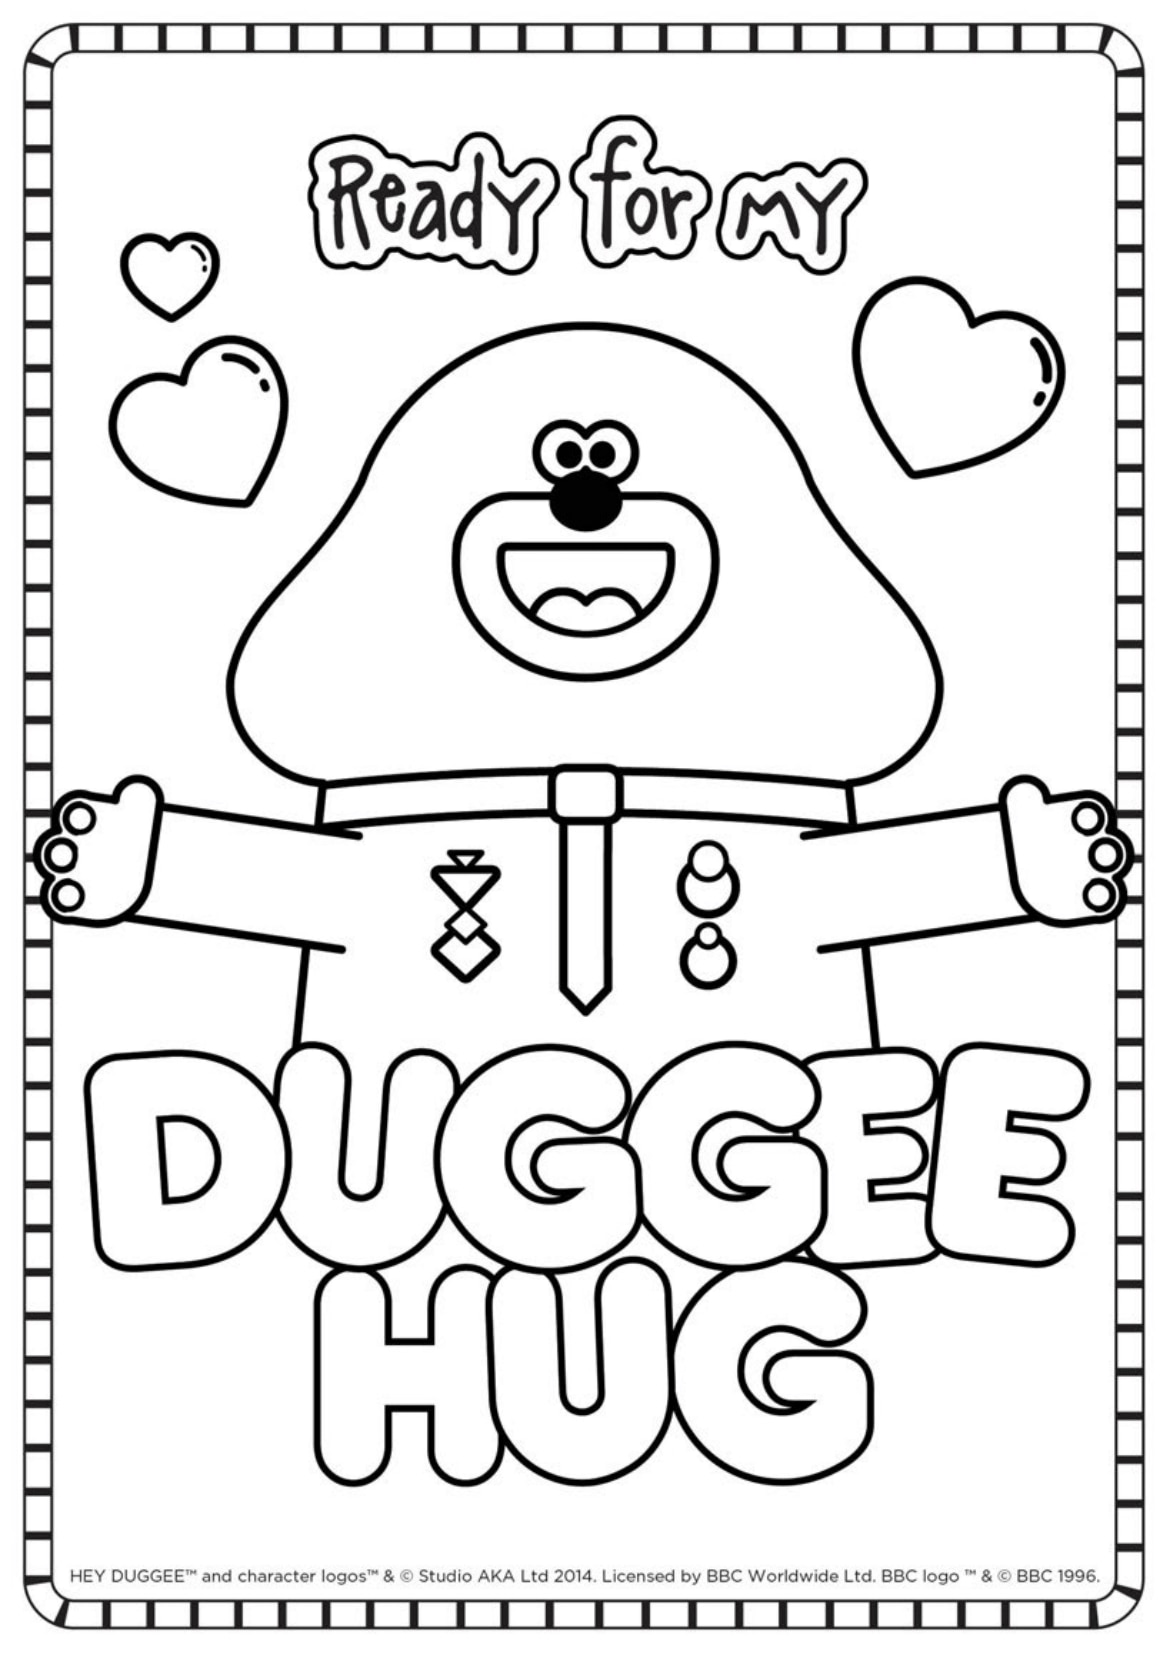 Duggee Hug Colouring Sheet